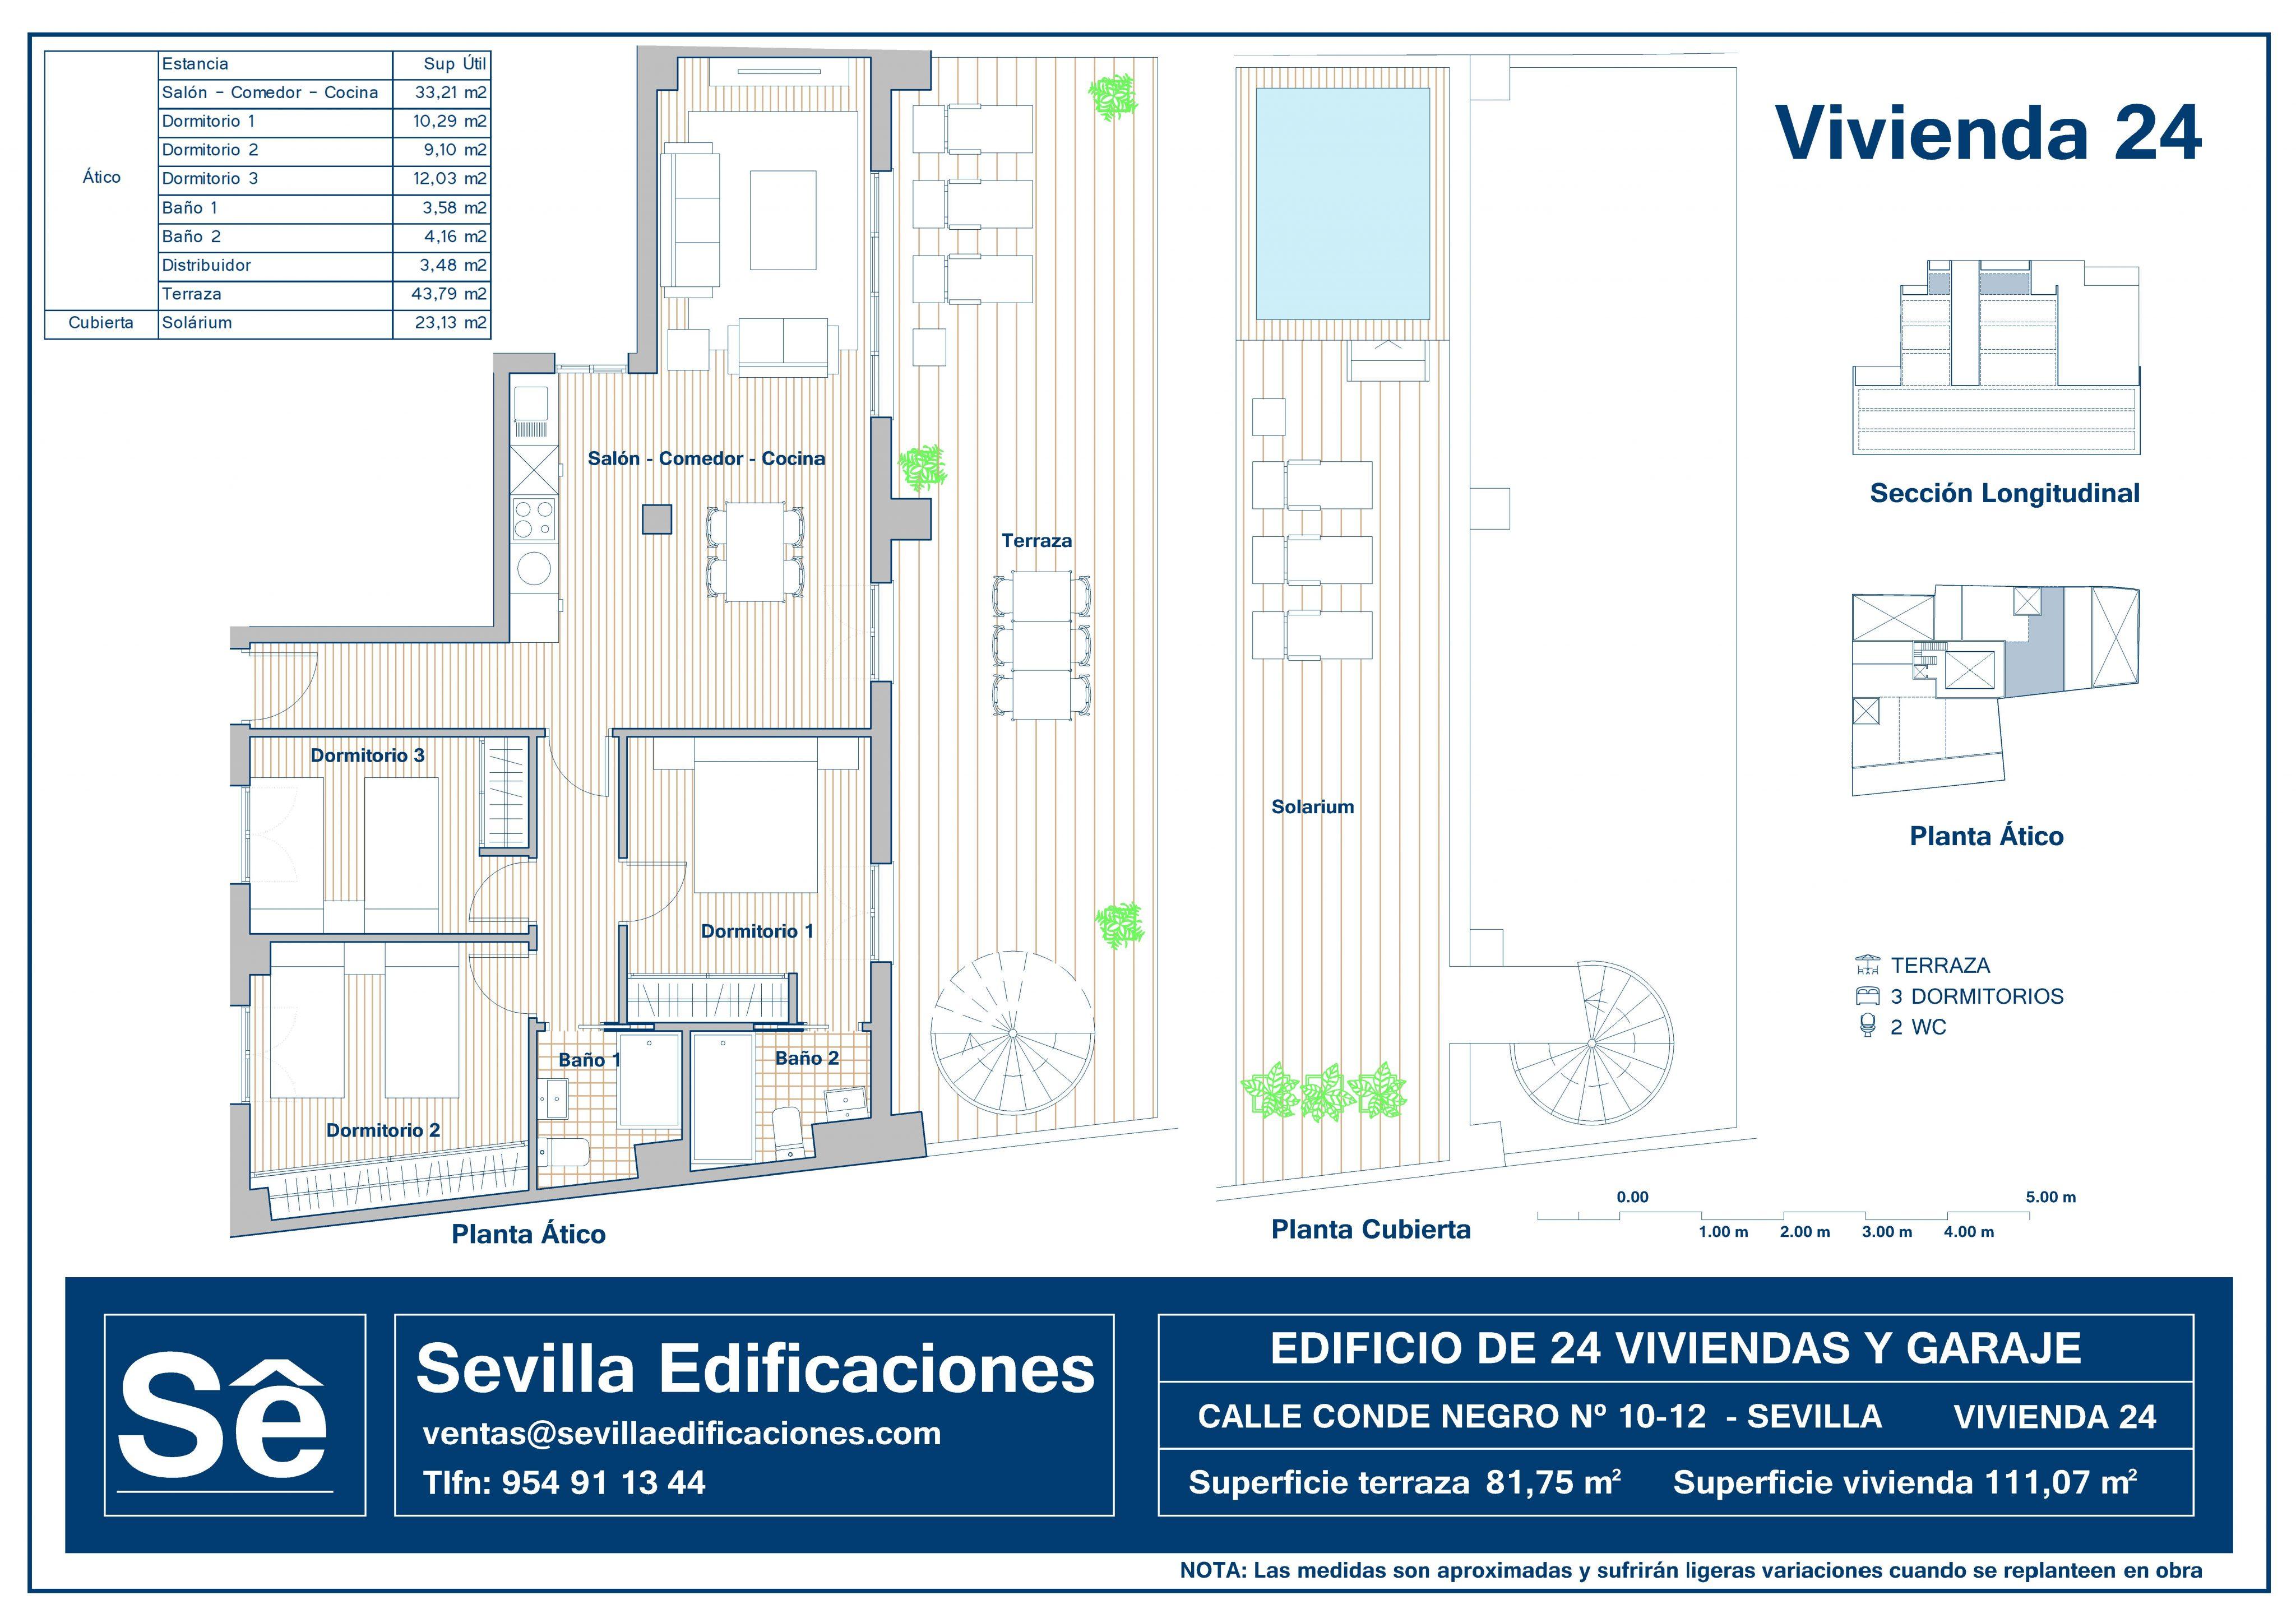 CONDENEGRO_VIVIENDA_24